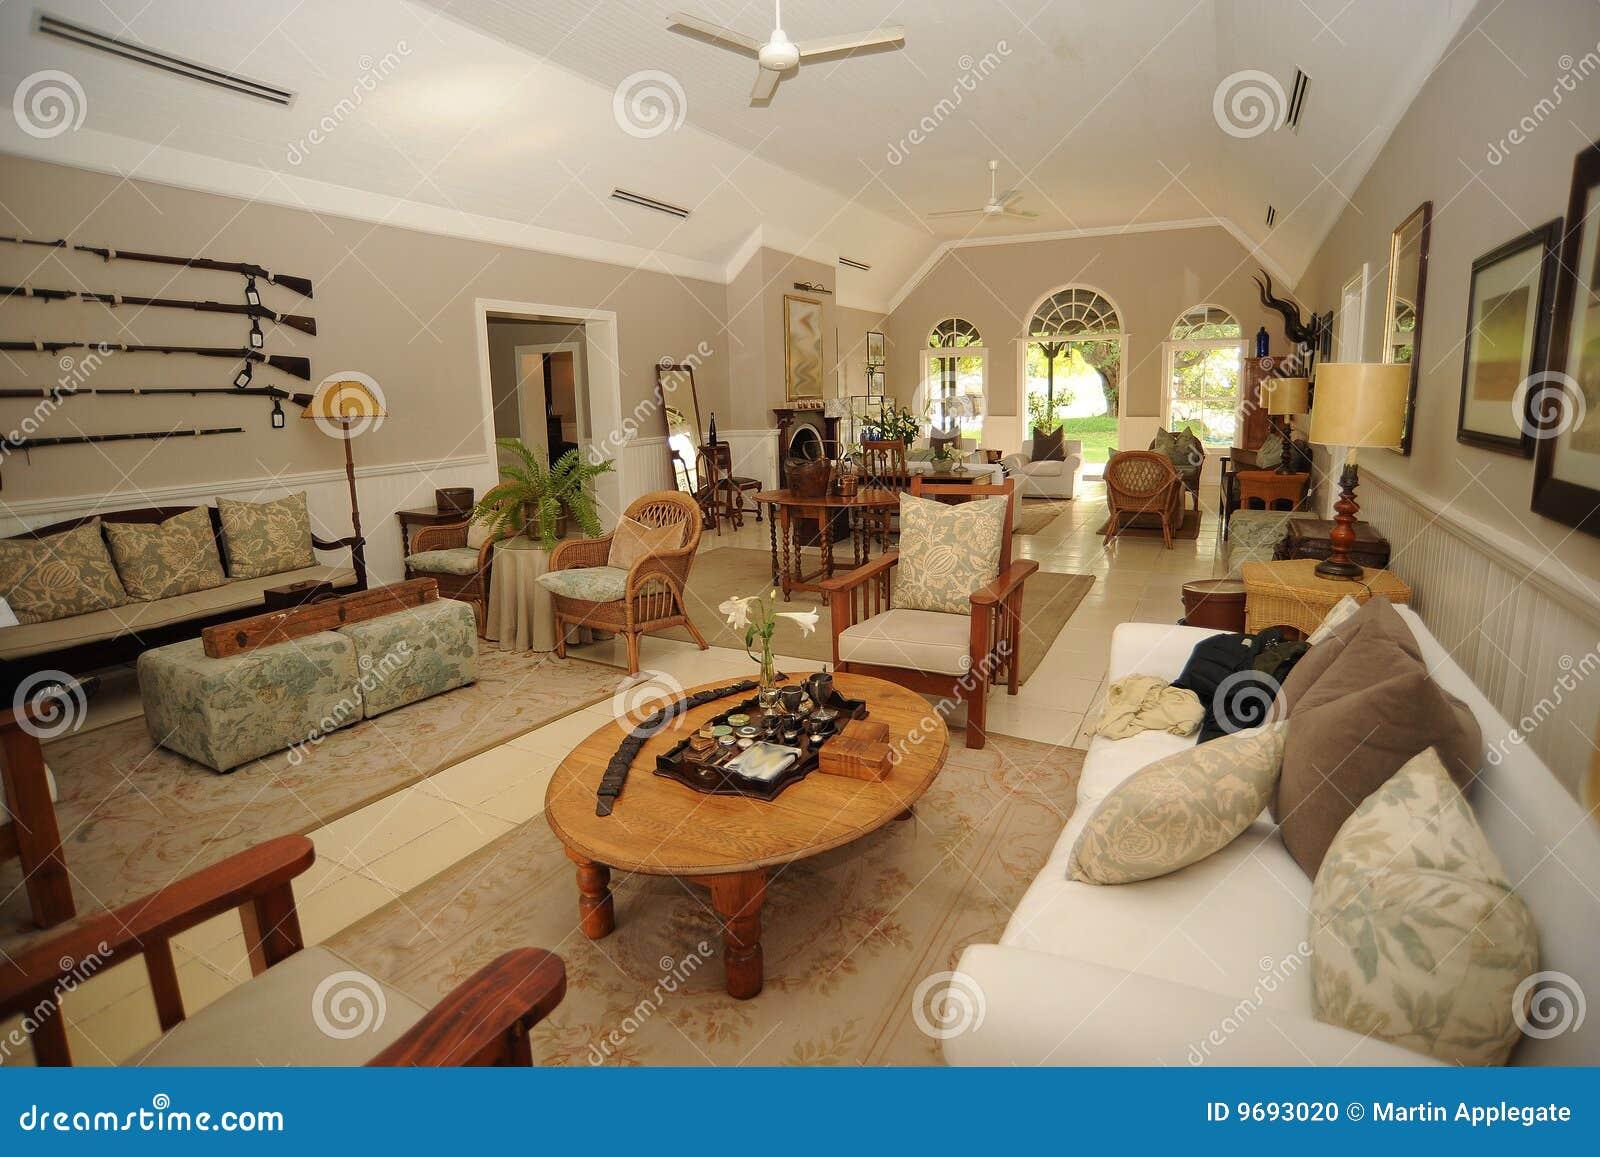 Safari lodge interior stock photo image of decoration 9693020 - Casas interiores decoracion ...